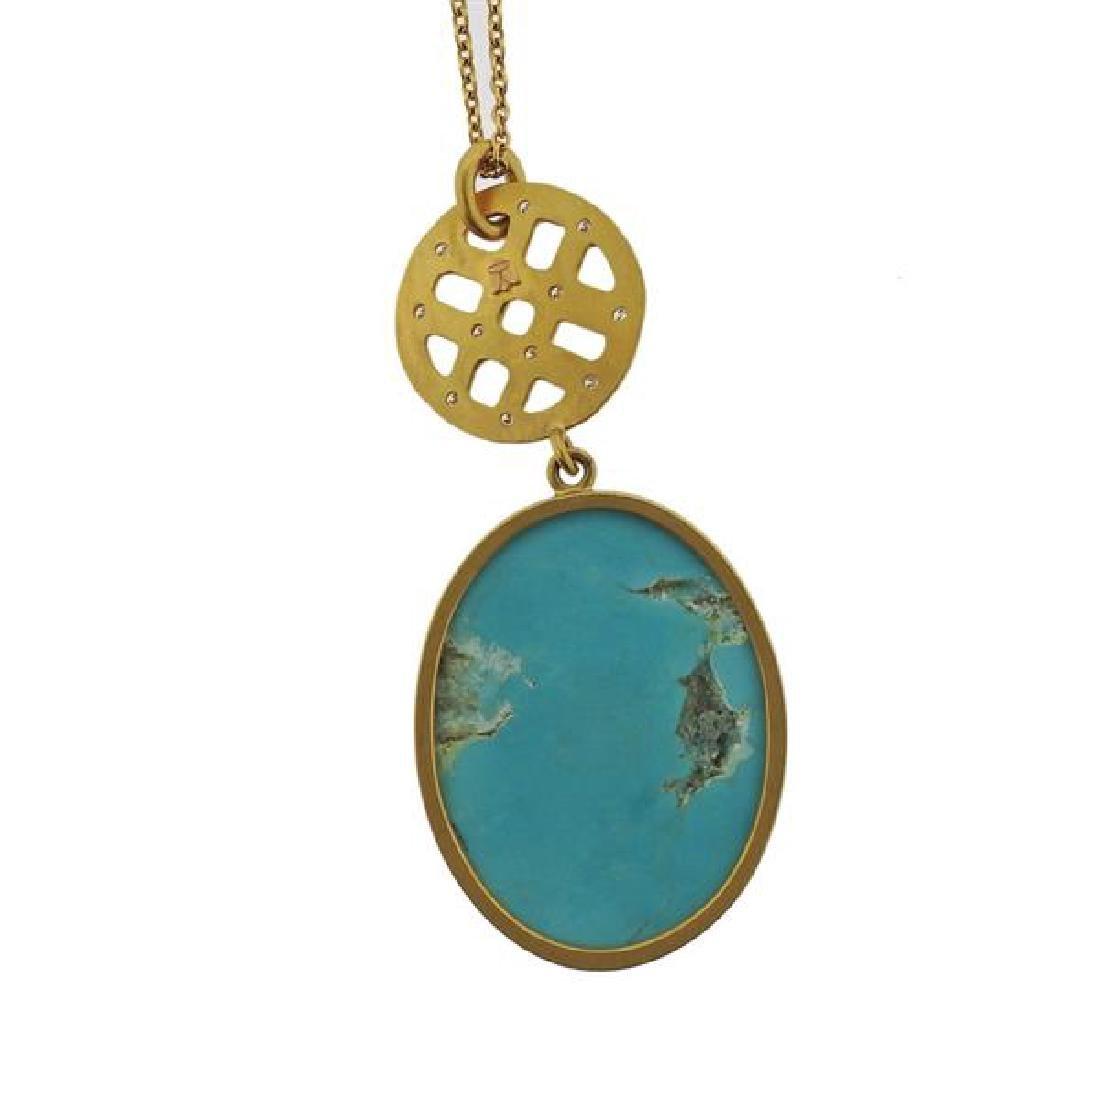 22K Gold Diamond Turquoise Pendant  Necklace - 3